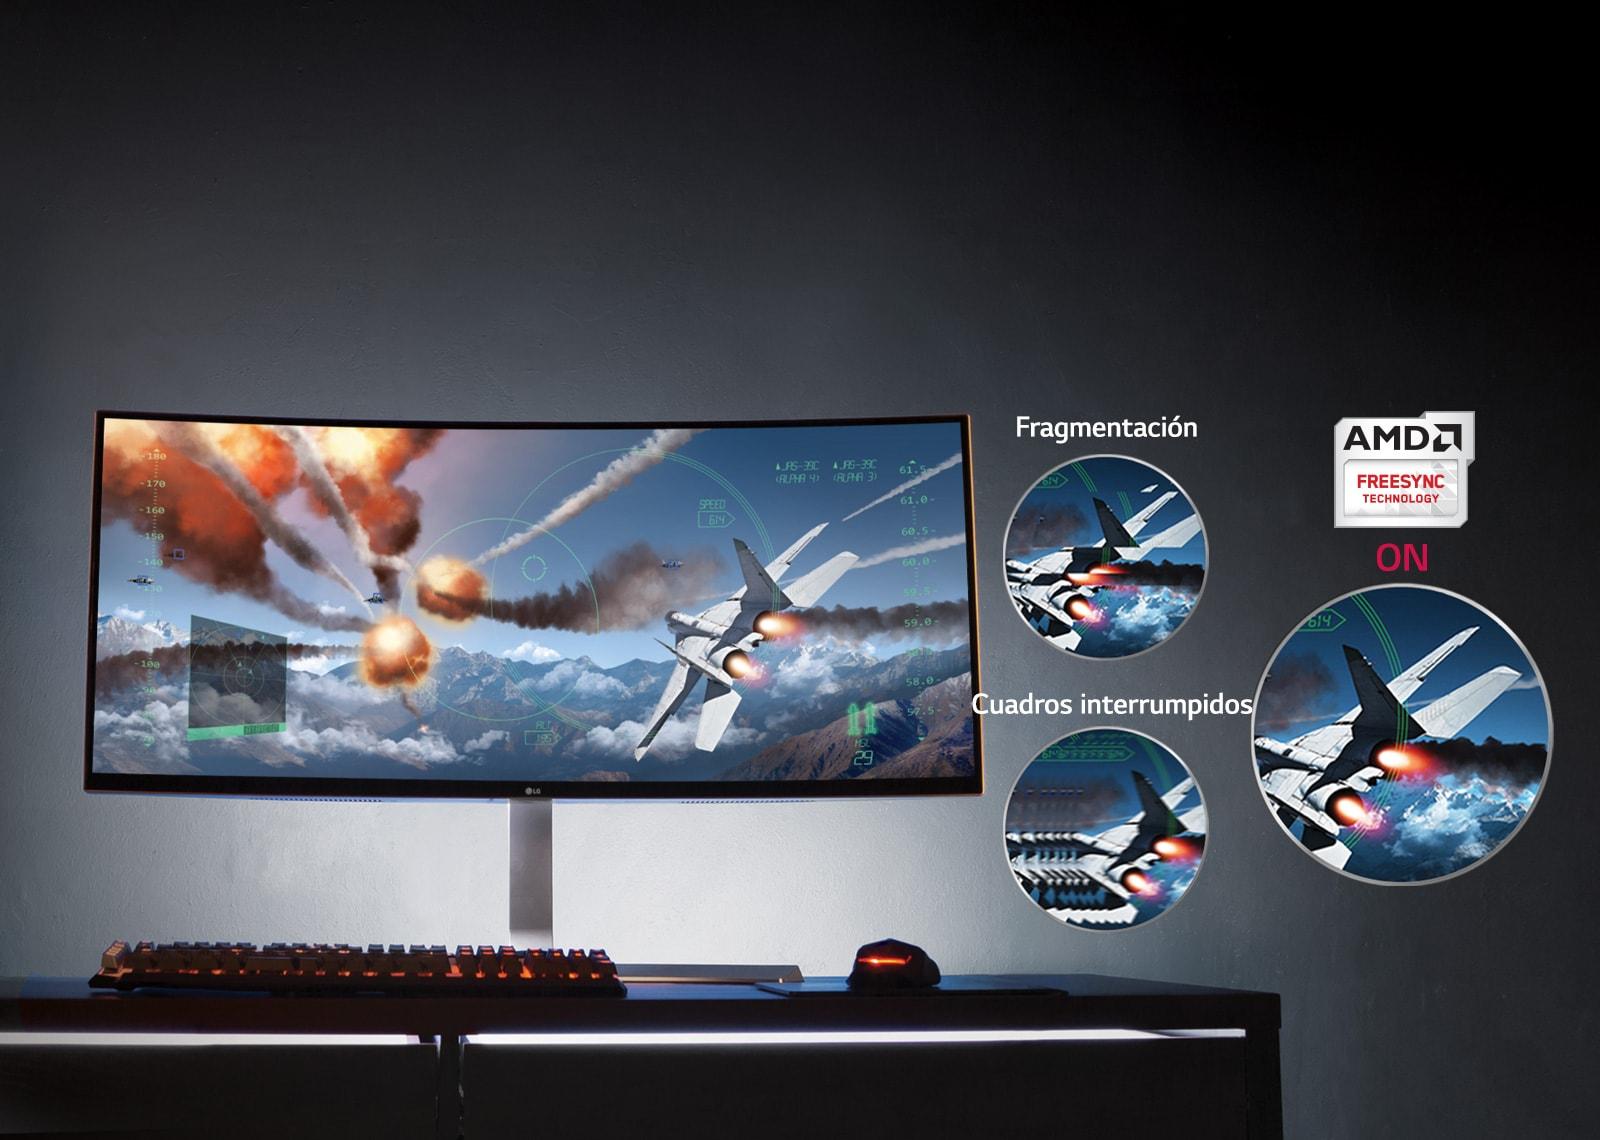 Tecnología AMD FreeSync™